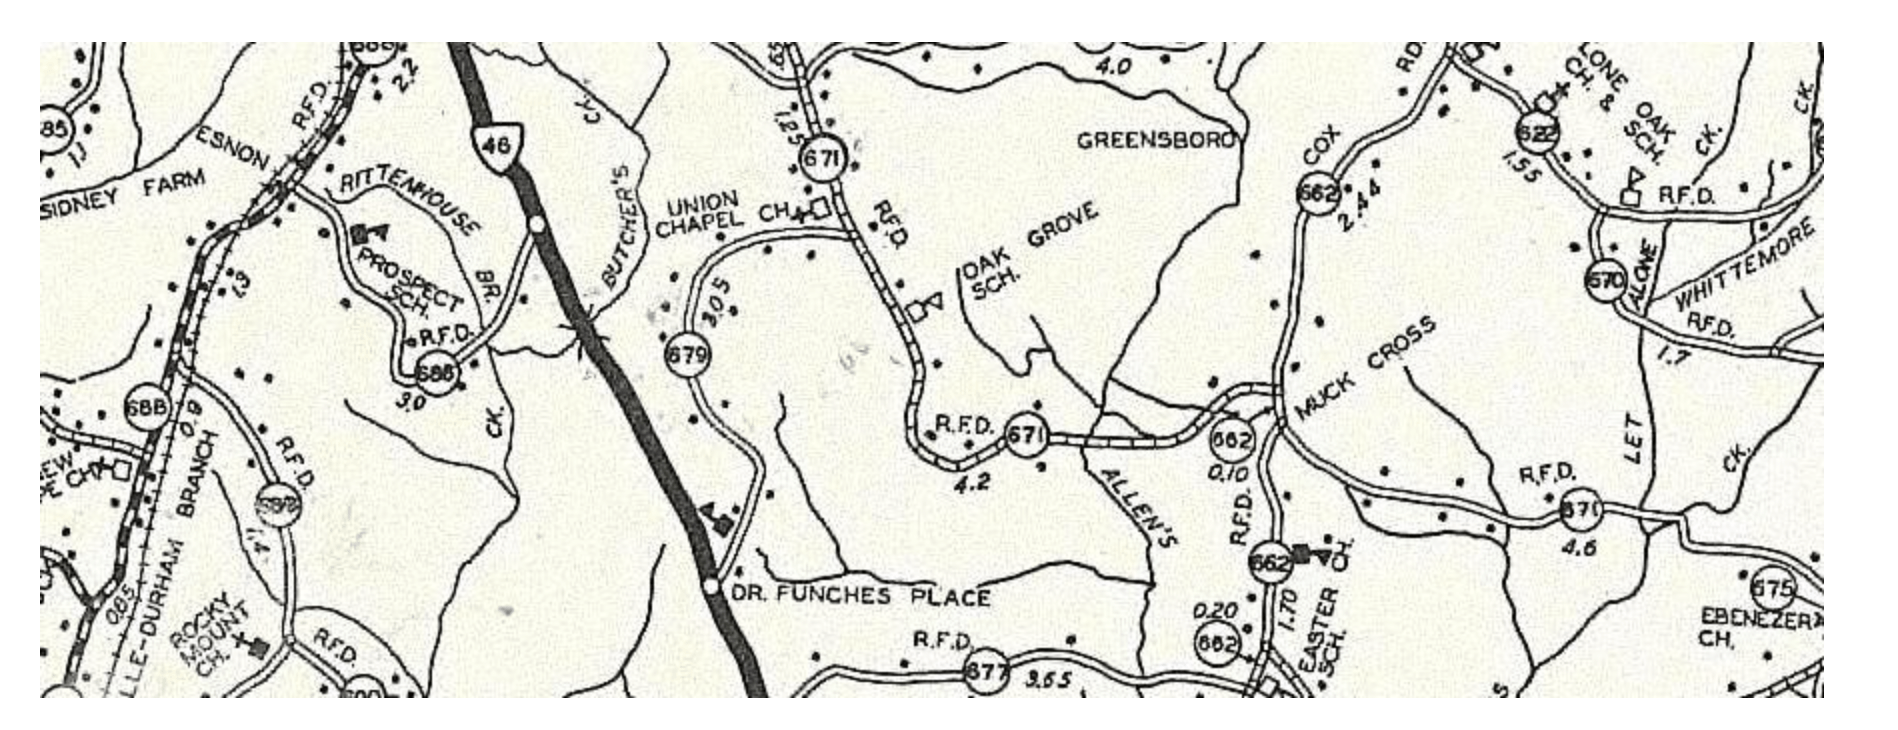 Hunter's Lane, Mecklenburg County, VA 1932